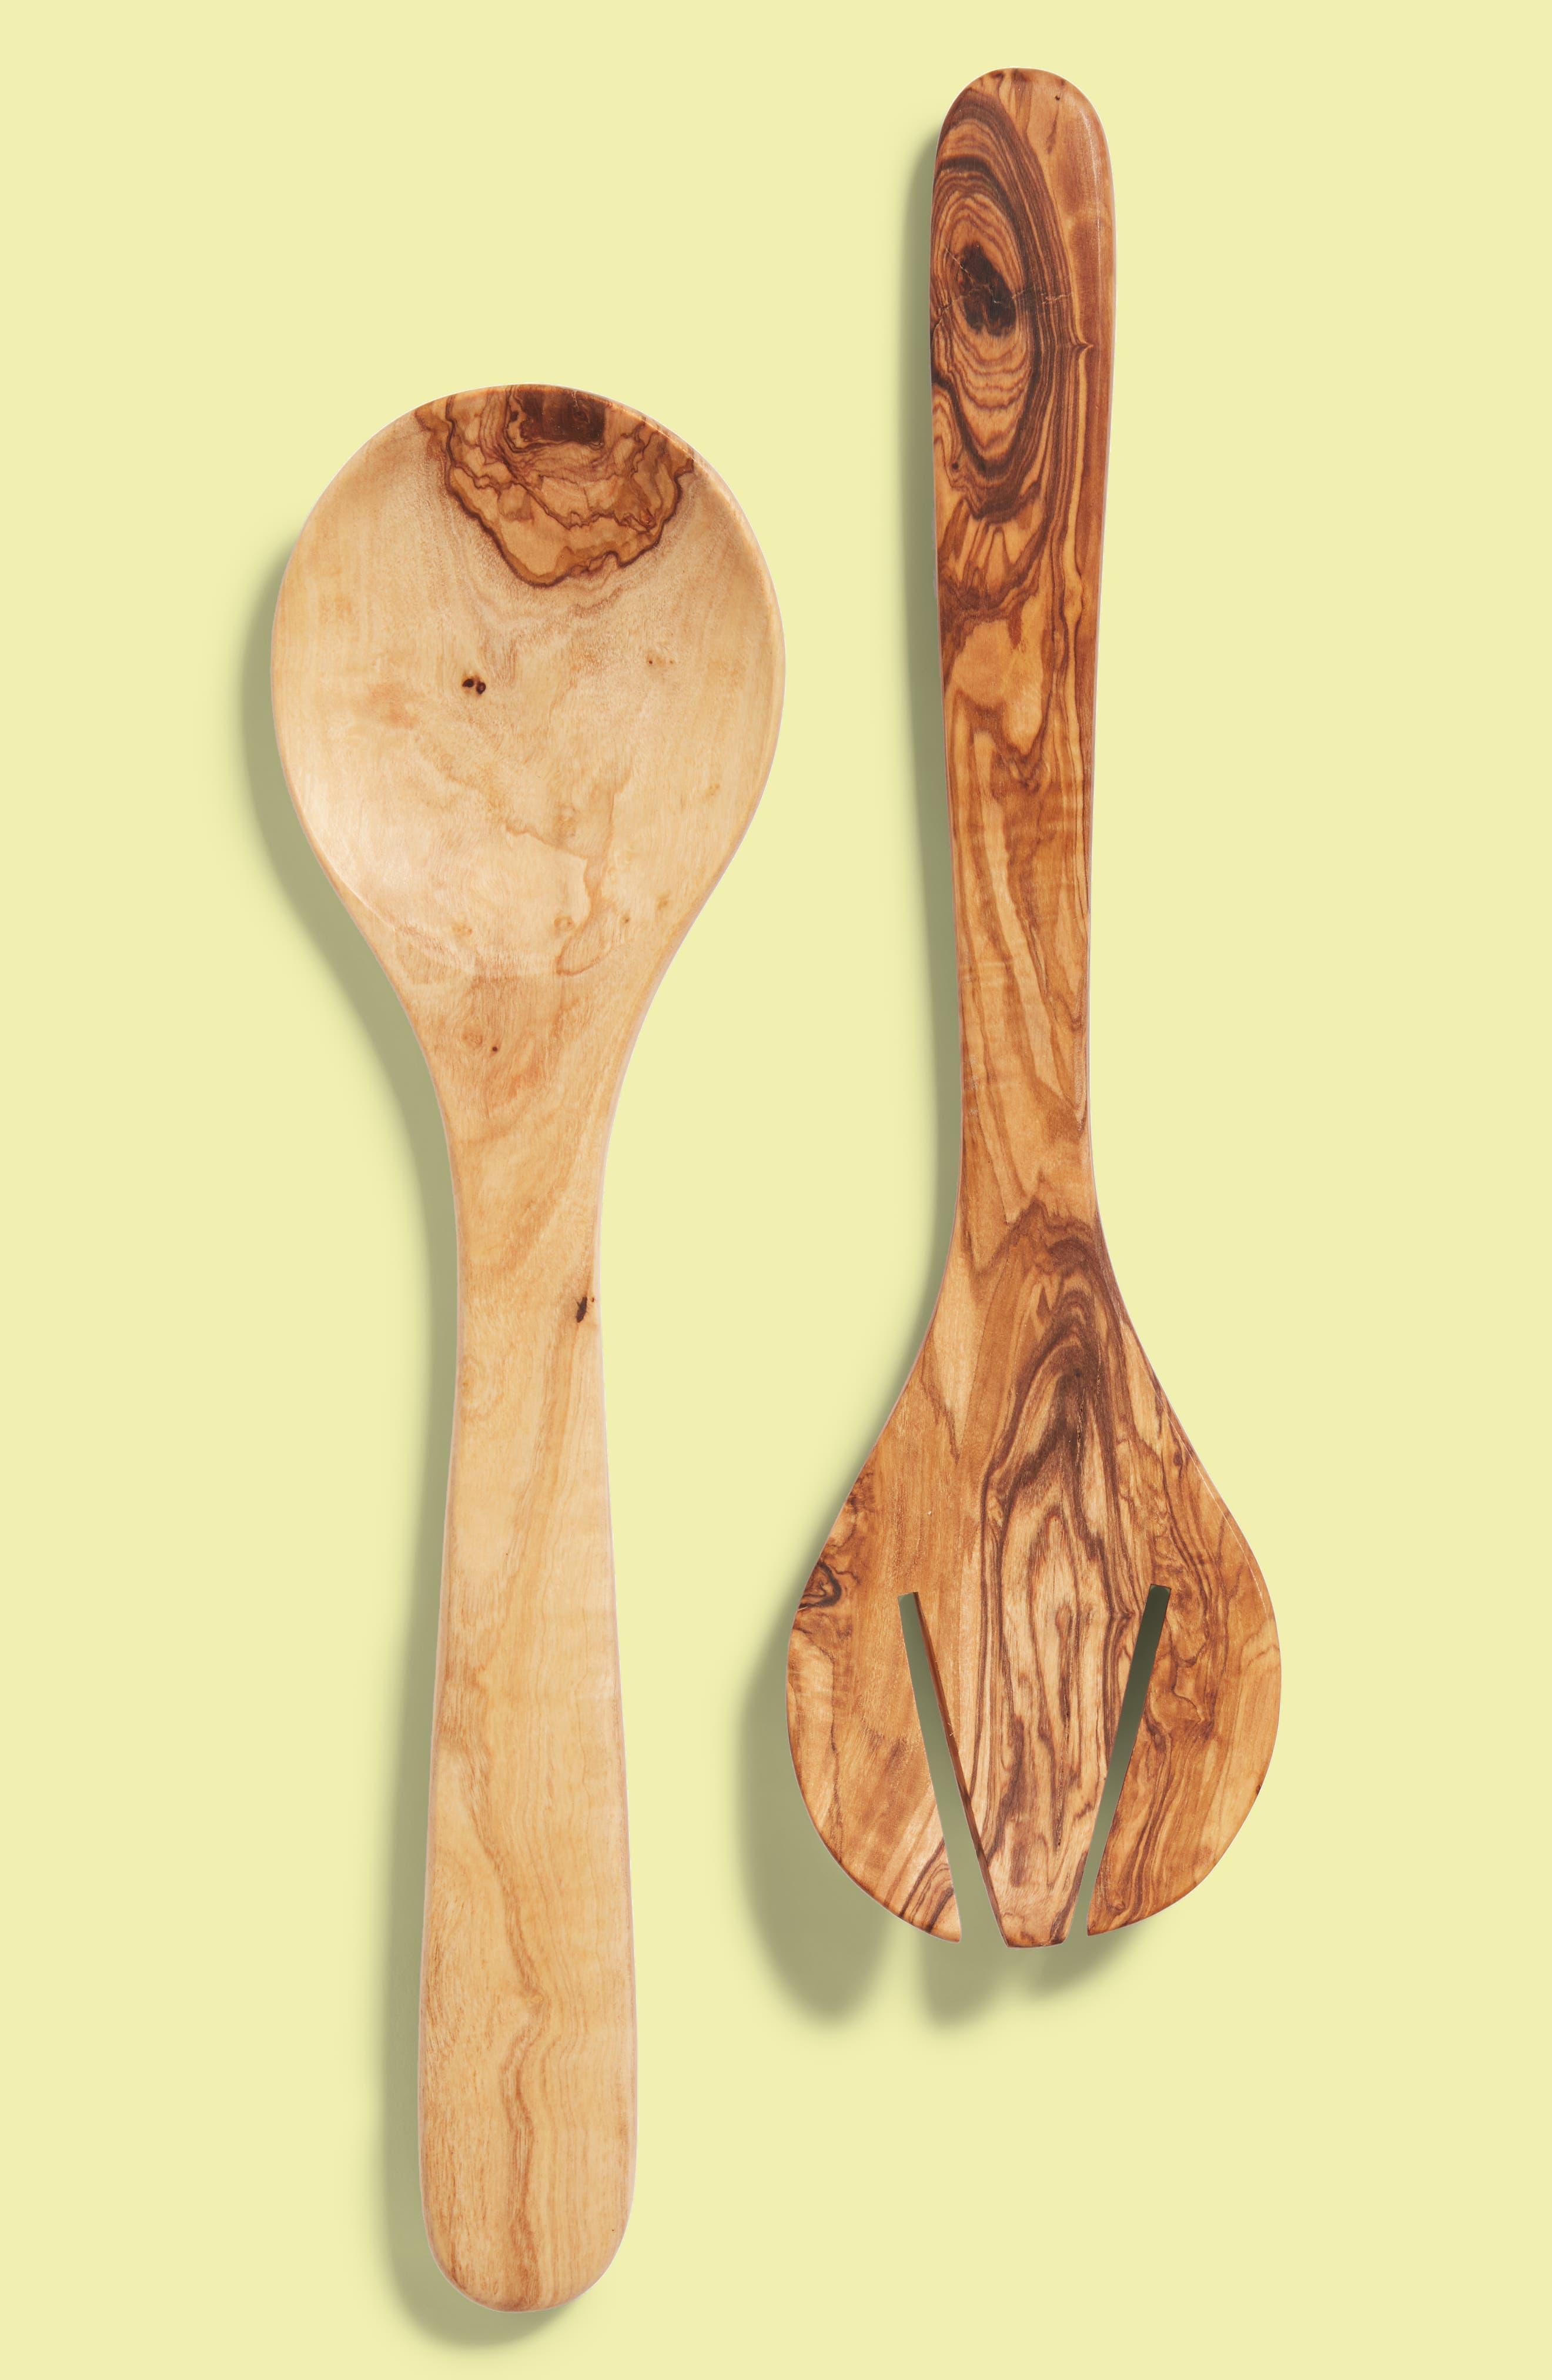 2-Piece Olive Wood Round Serving Set,                         Main,                         color, Wood